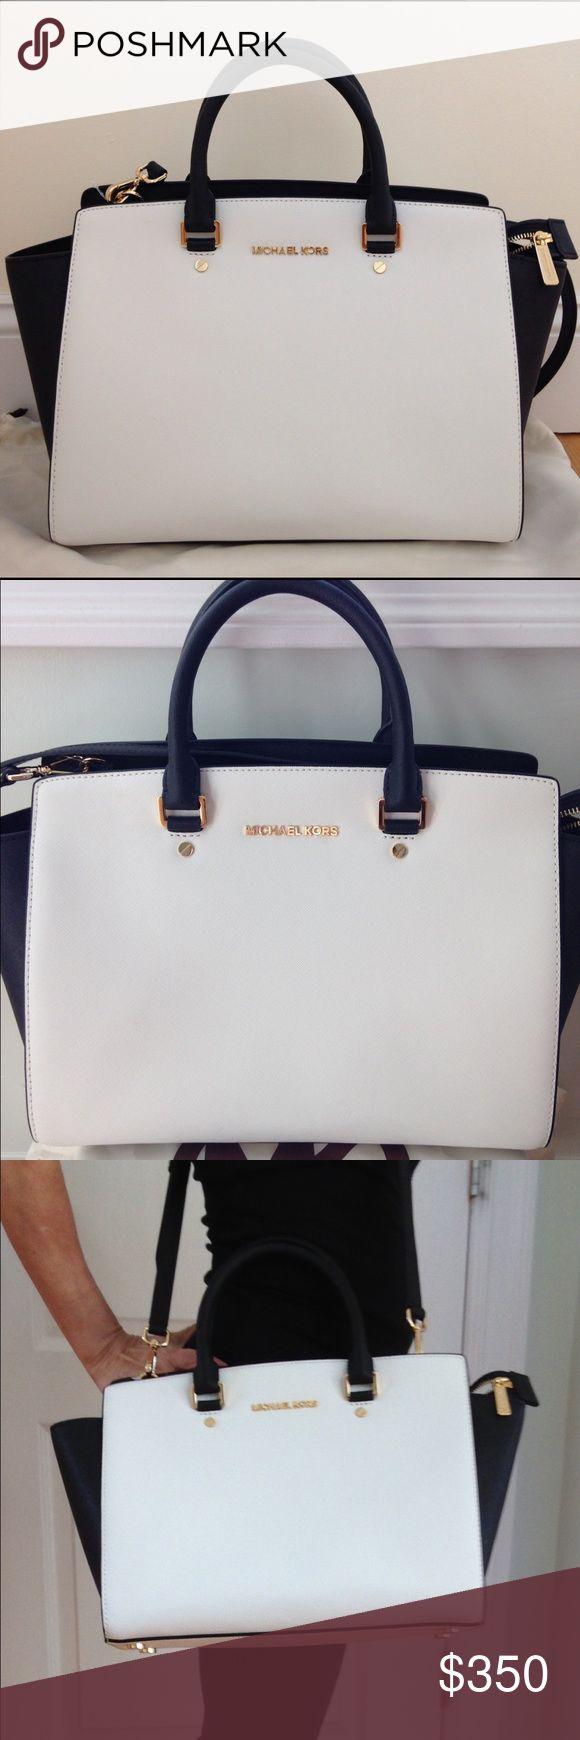 "Michael Kors - Elegant and classic handbag 100% Saffiano leather. Gold tone hardware 14'W x 9""H x 3.5""D. Handle drop 4.5"". Adjustable strap 17.5""-19.5"". Interior zip pocket 3 open pockets plus cell phone pocket. Pockets lining polyester. Michael Kors Bags"